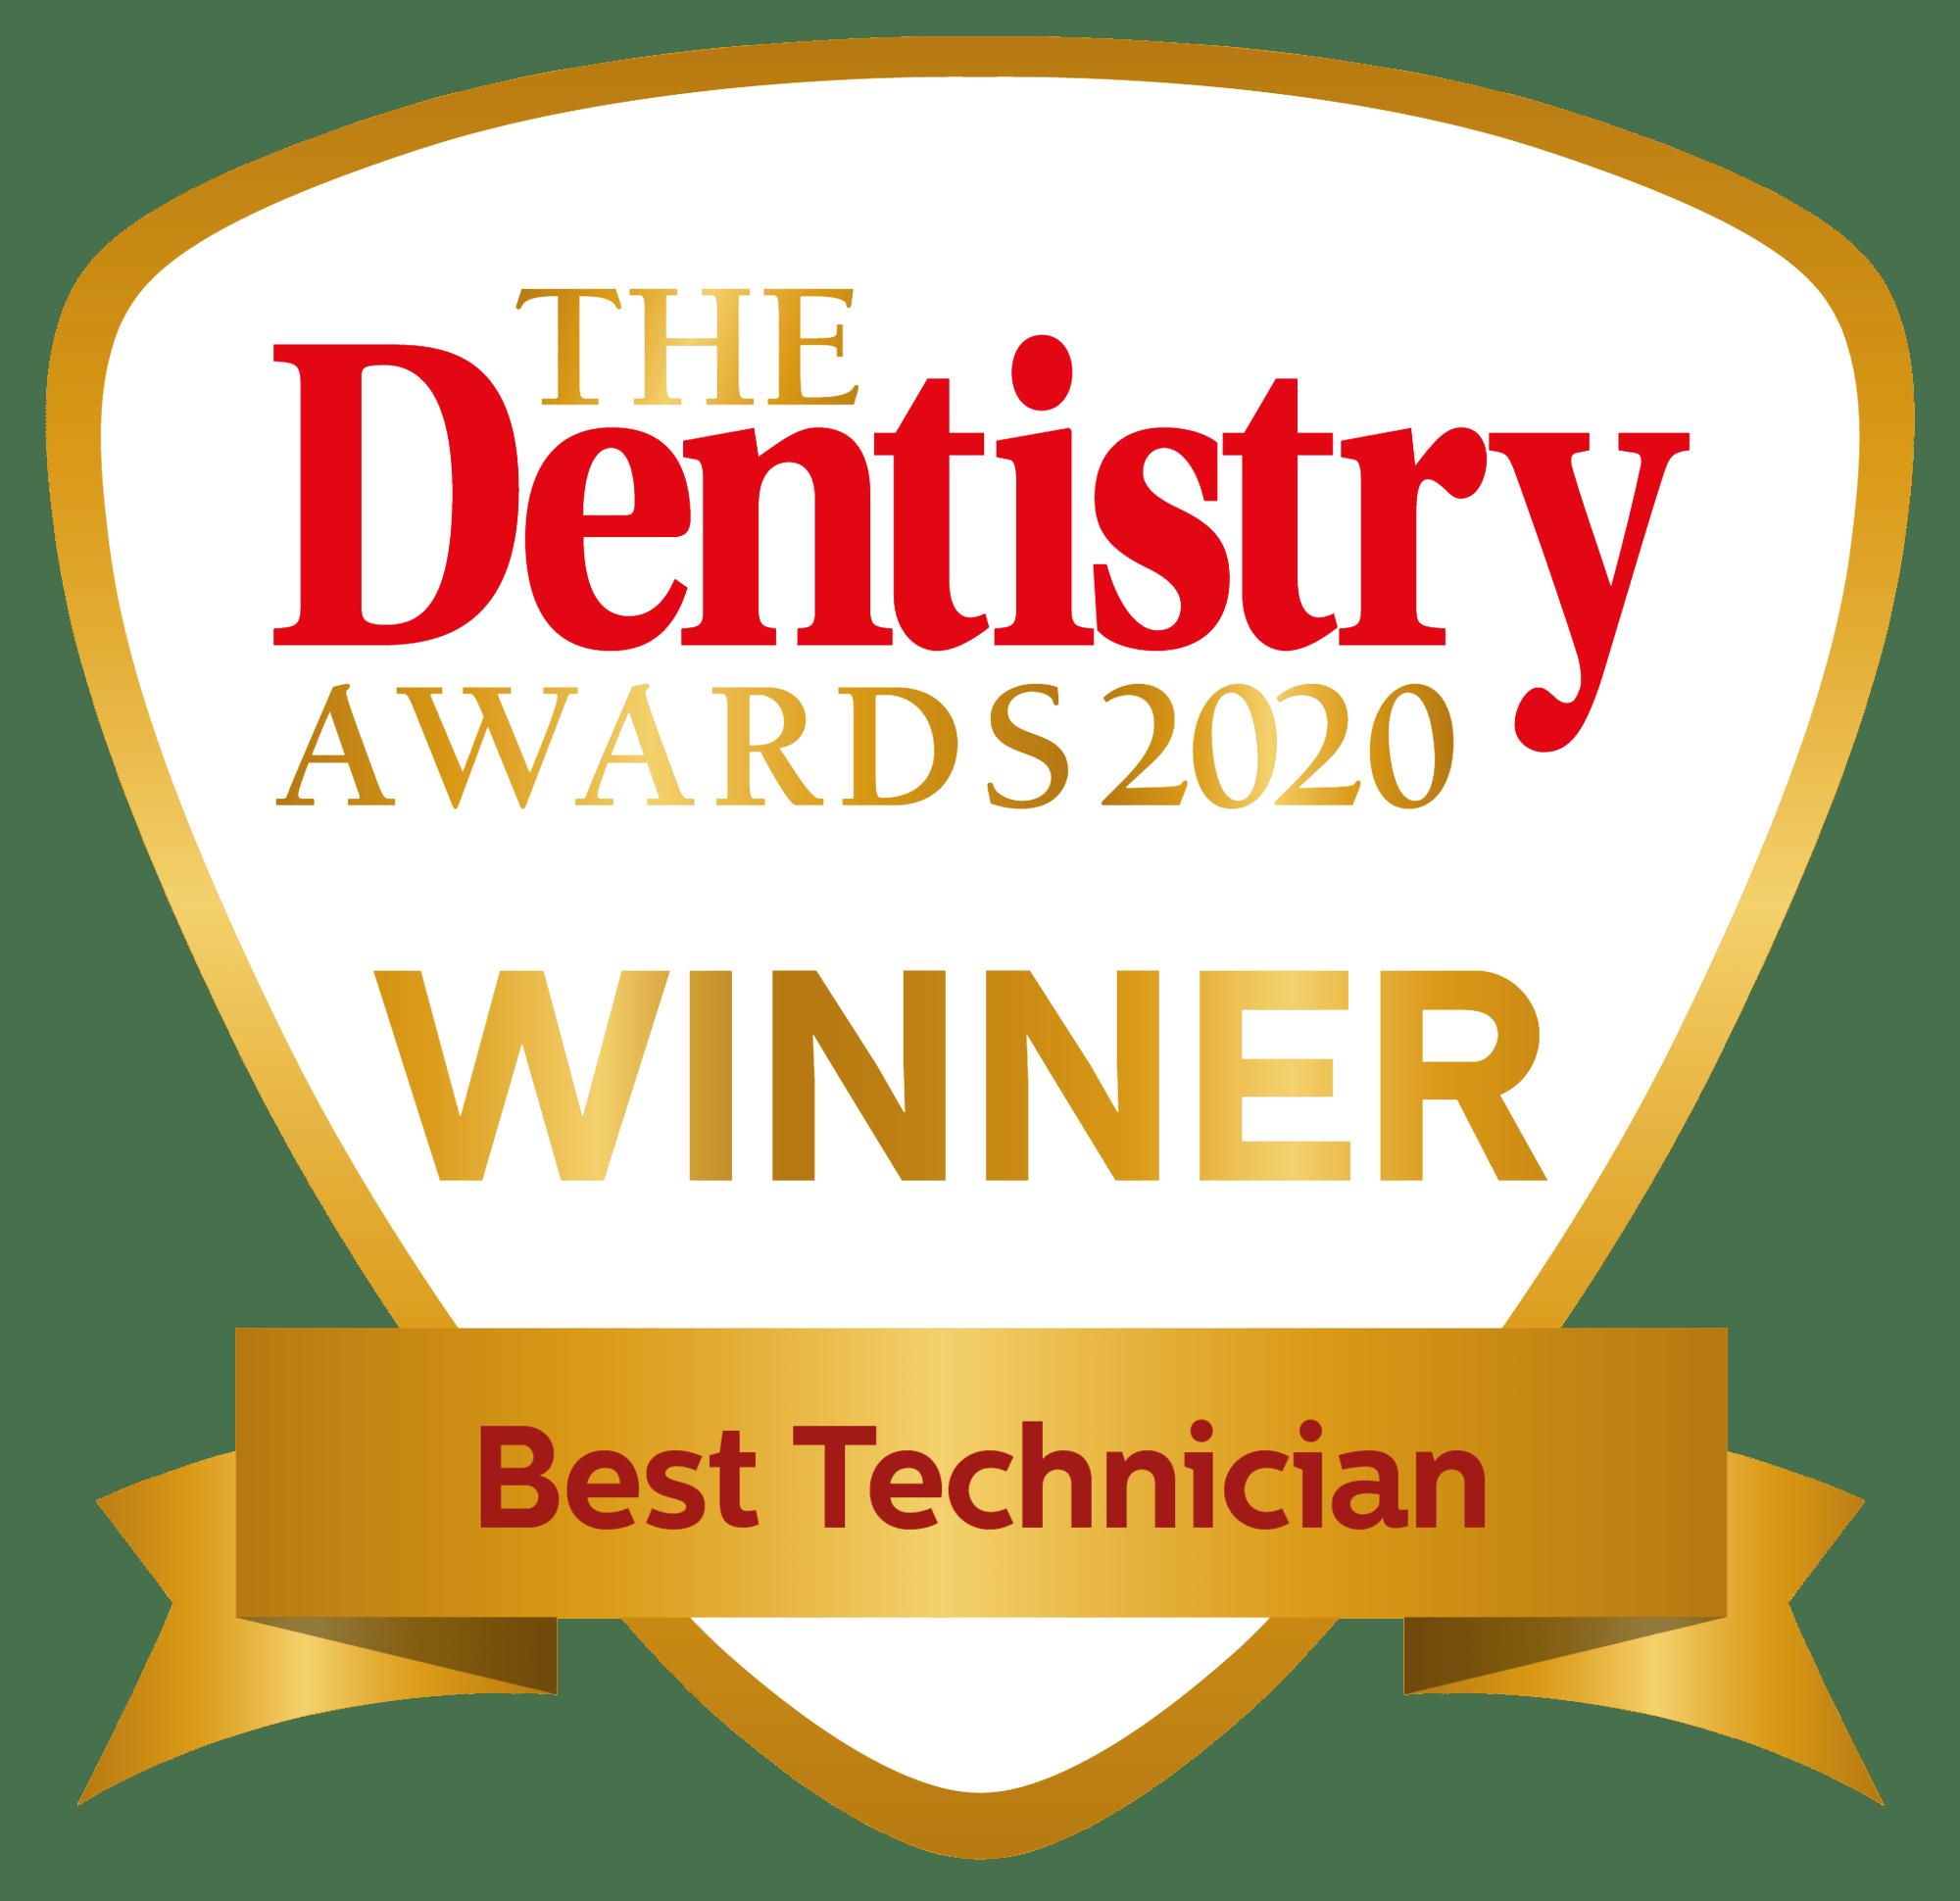 Dentistry awards 2020 best technician winner badge